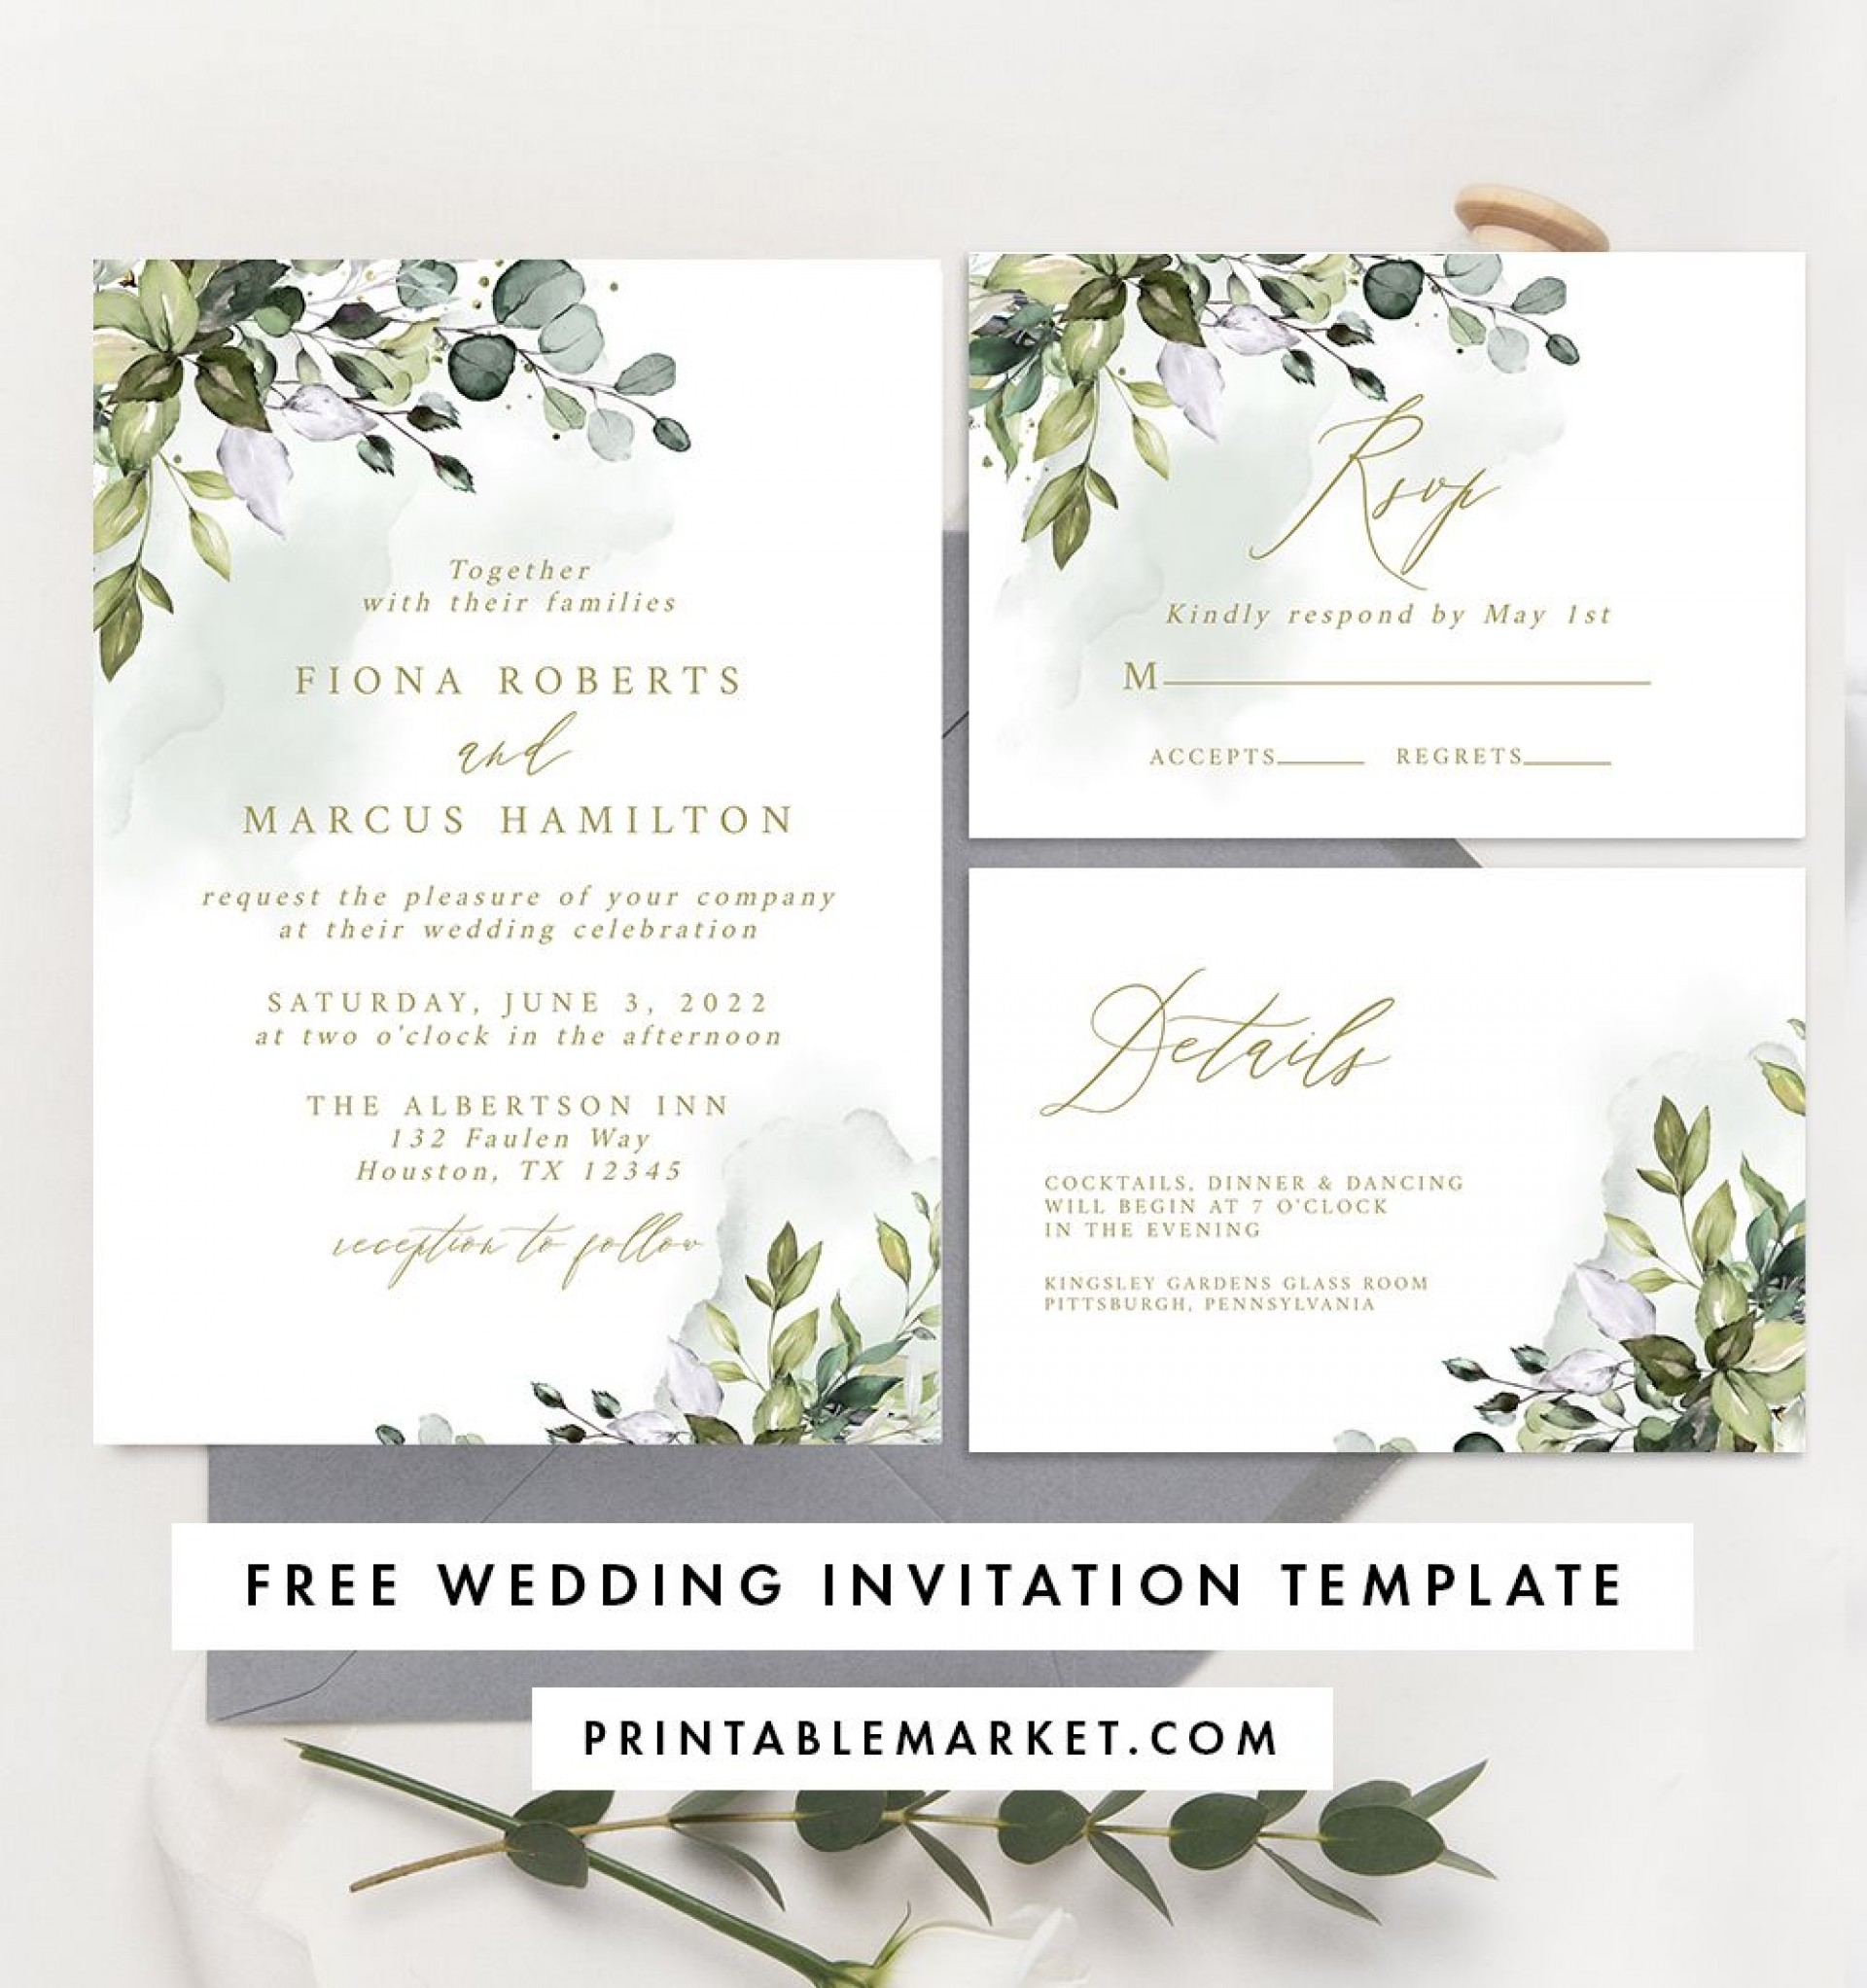 008 Dreaded Free Wedding Invitation Template Printable Sample  For Microsoft Word Mac1920